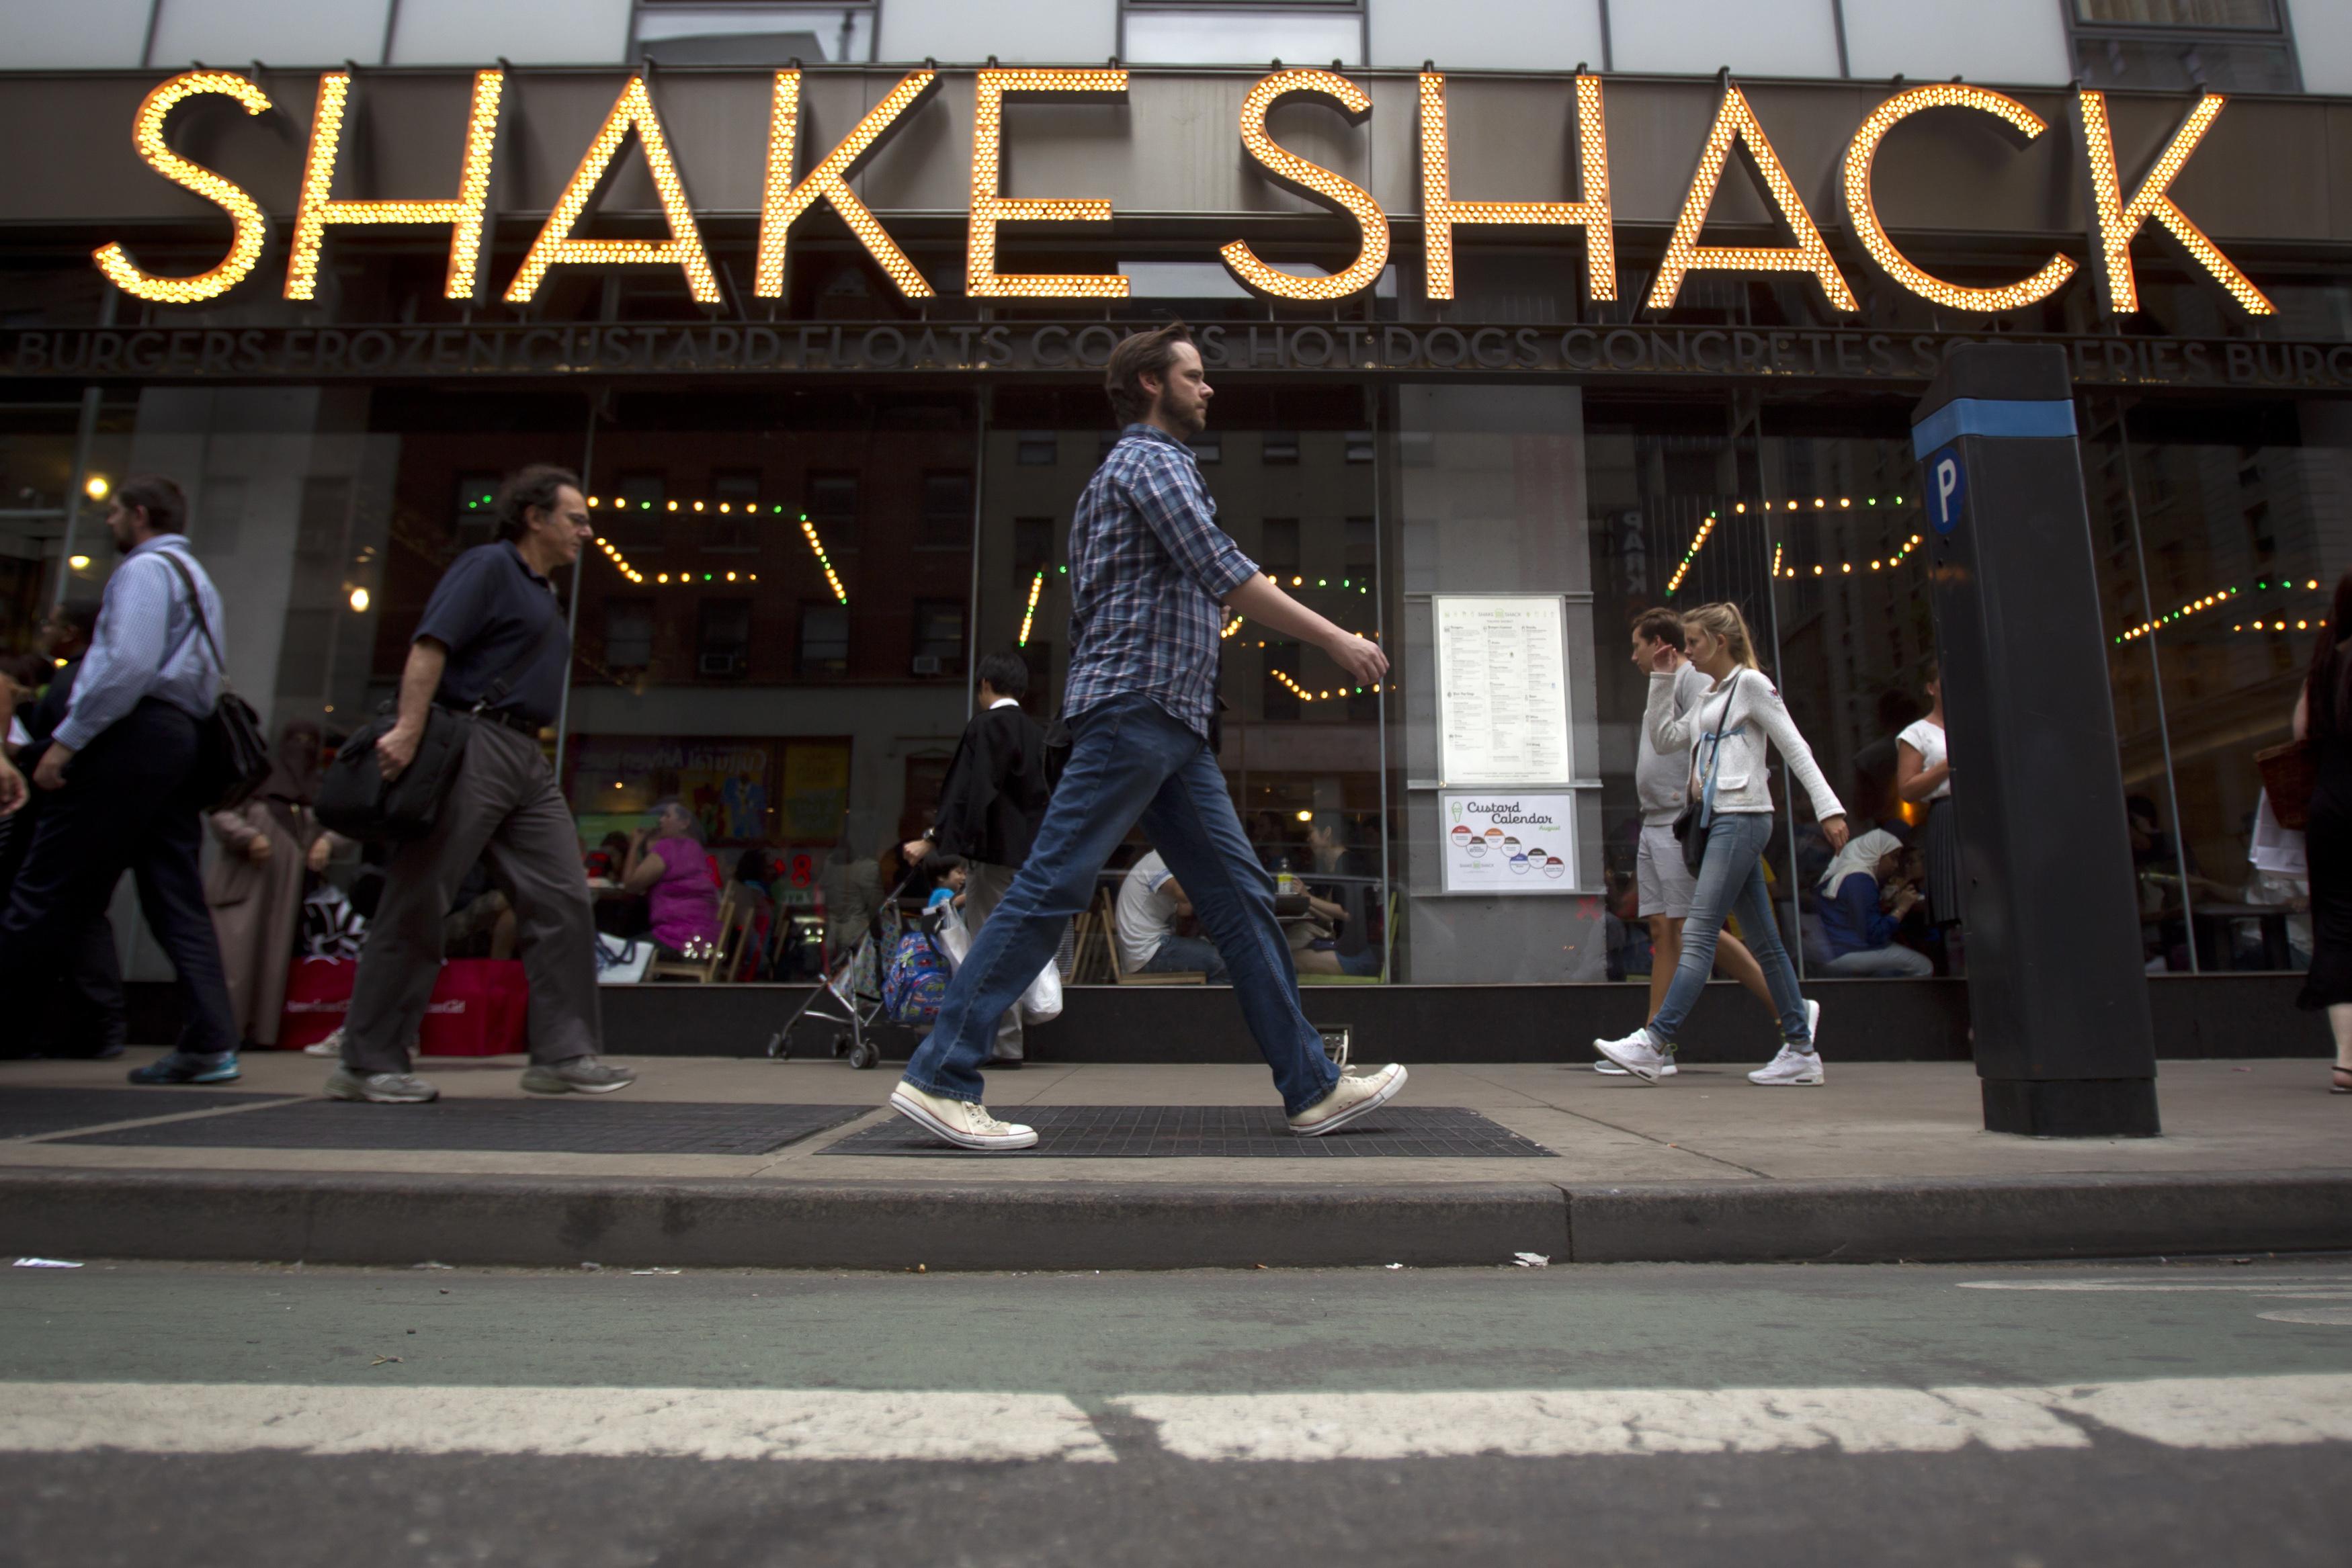 People walk past a Shake Shack restaurant in the Manhattan borough of New York August 15, 2014.